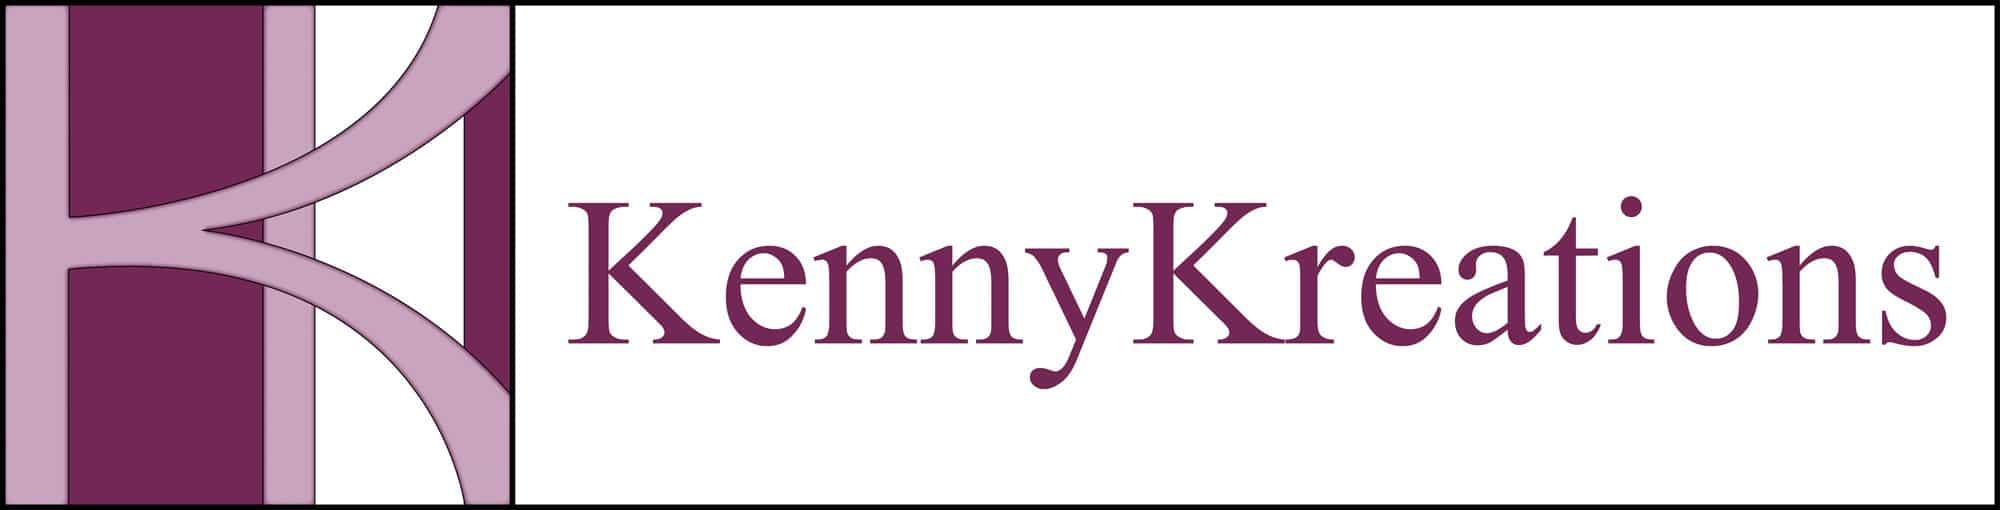 KennyKreations